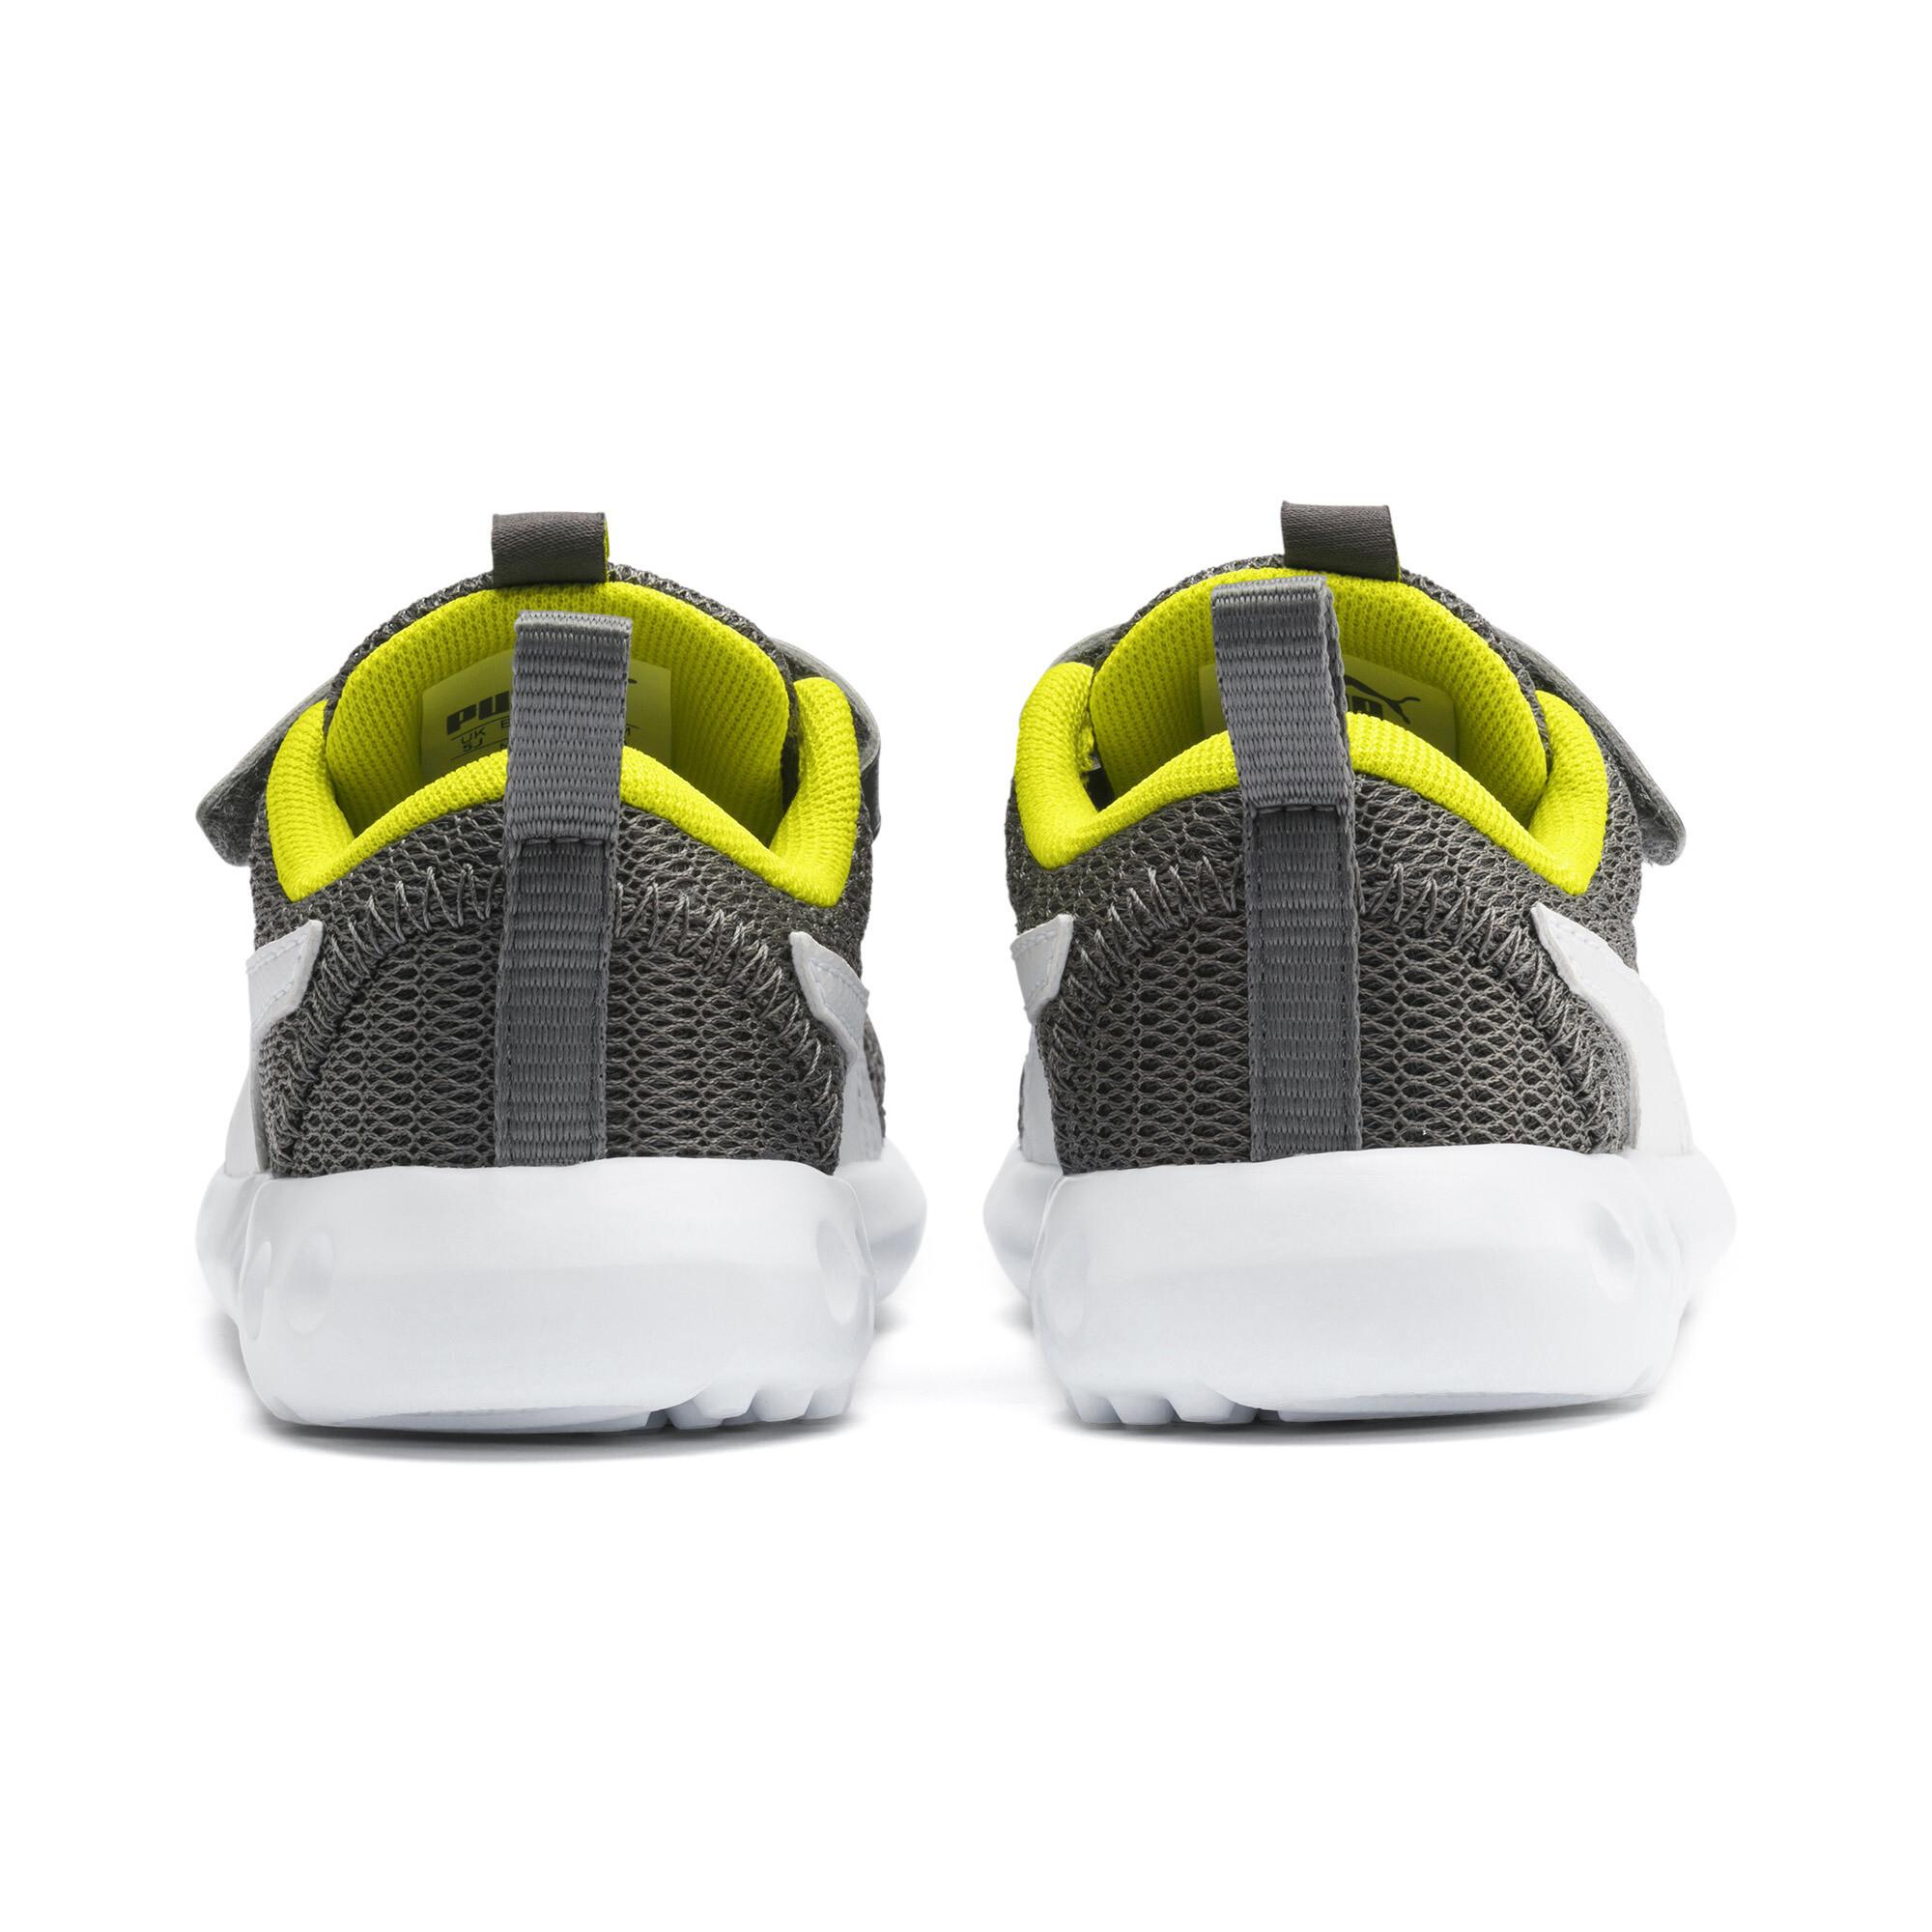 PUMA-Carson-2-Toddler-Shoes-Unisex-Shoe-Kids thumbnail 22